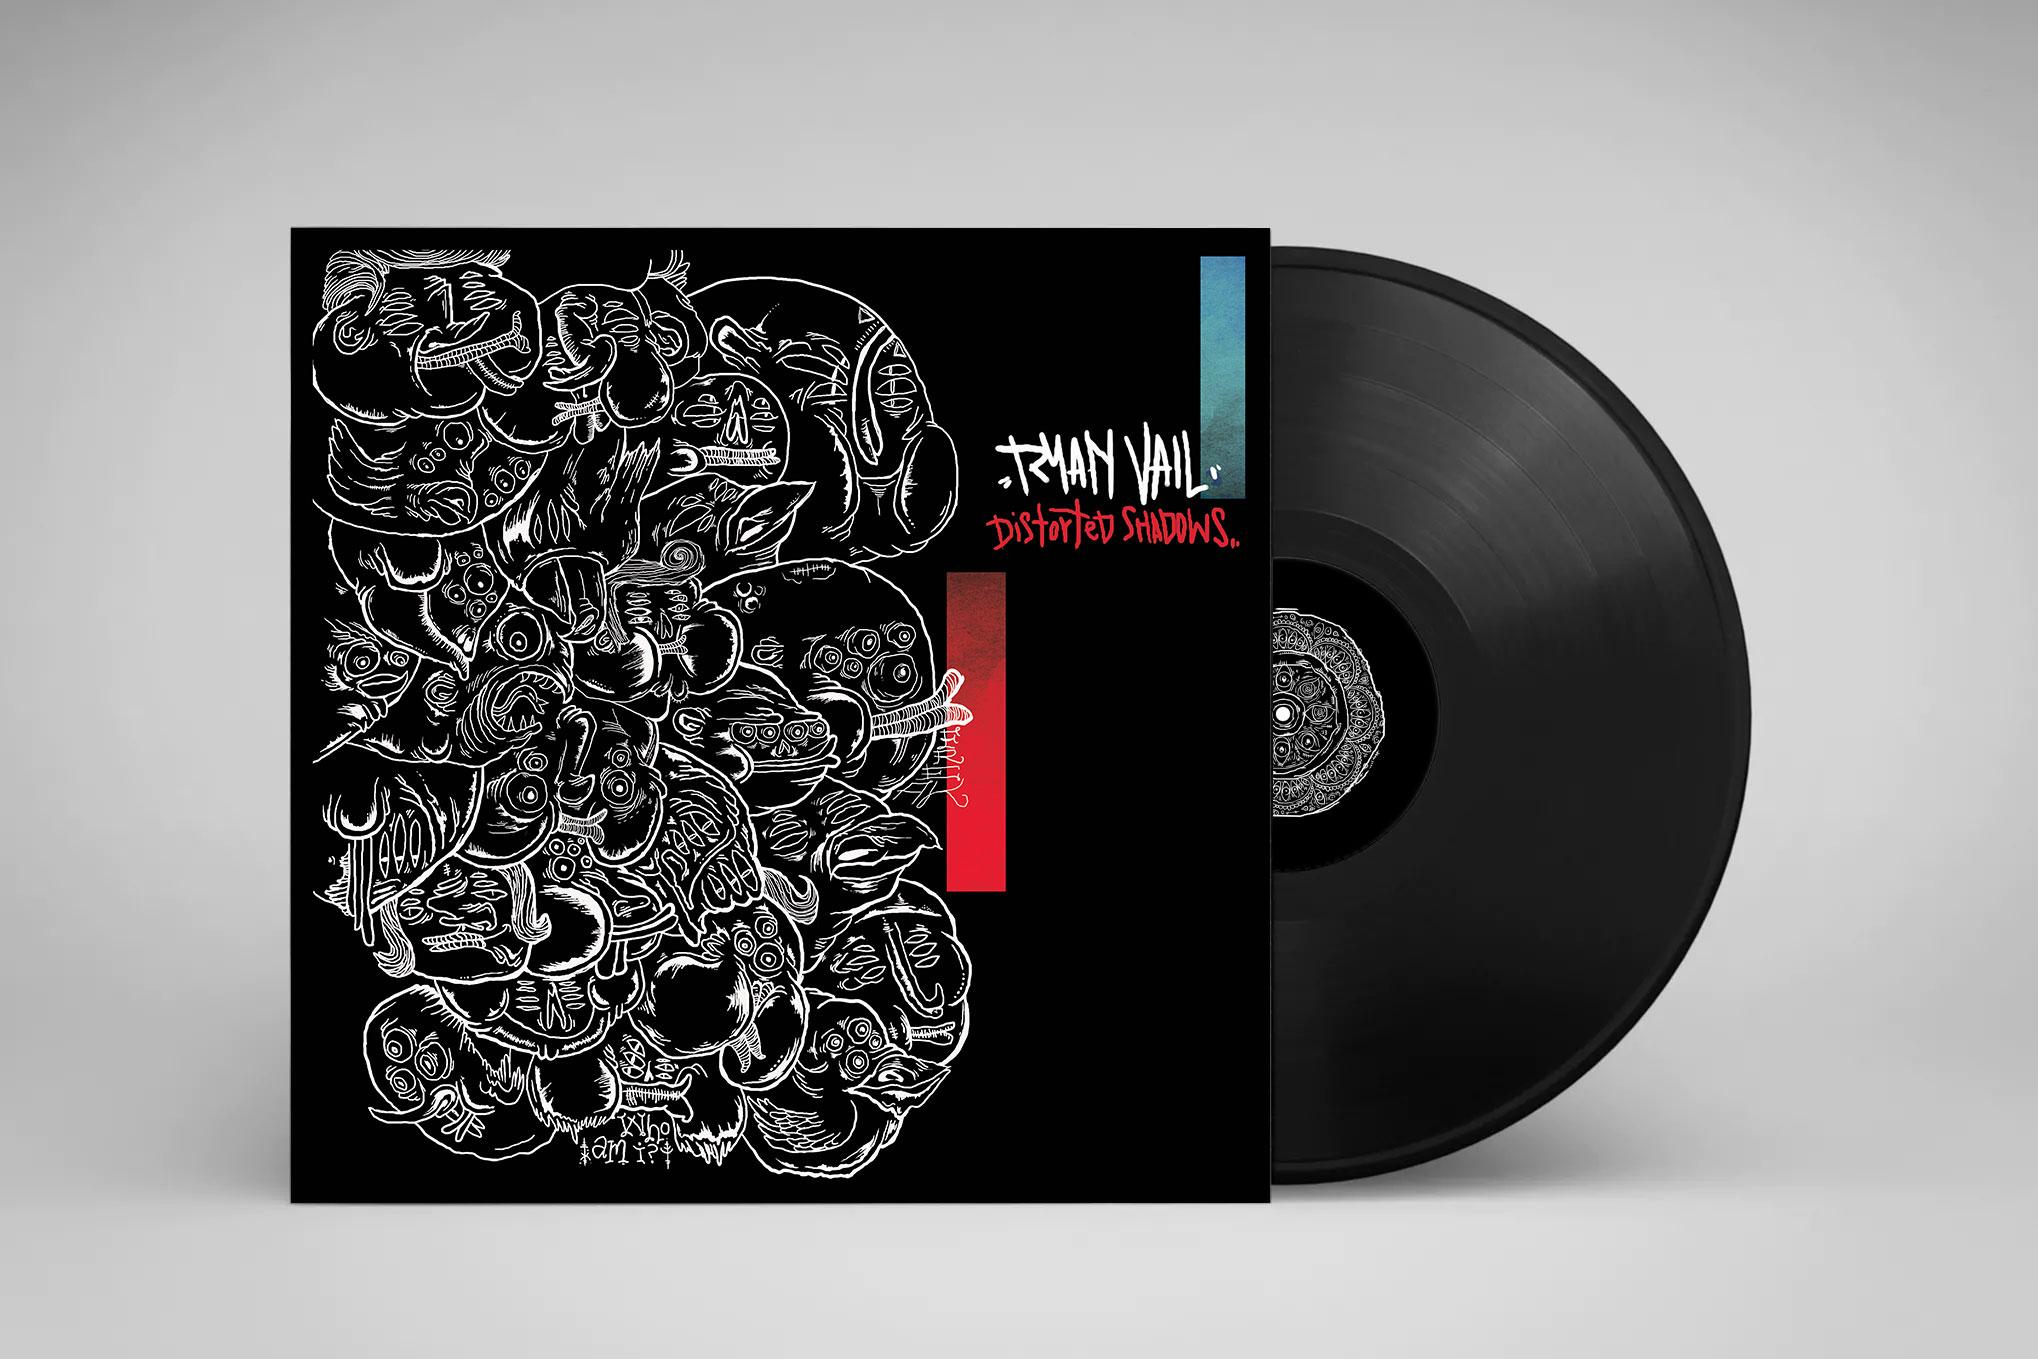 Distorted Shadows Vinyl - Quiet Arch